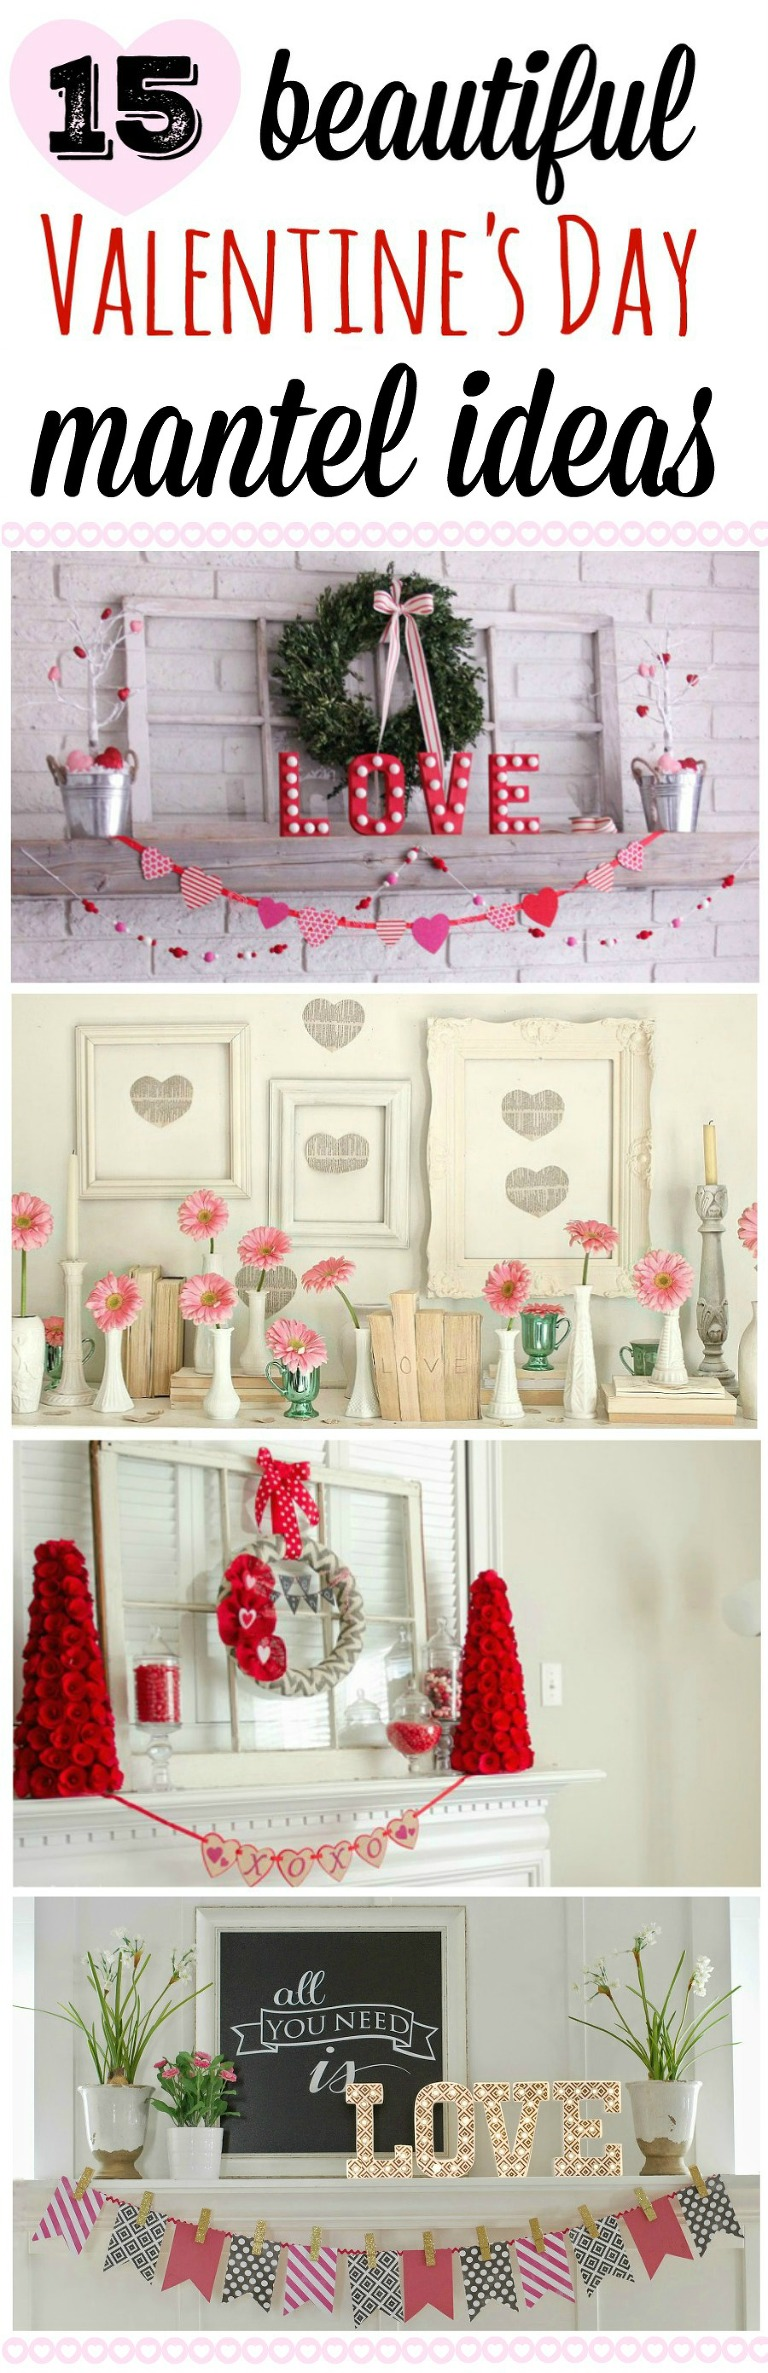 15-beautiful-valentines-mantelideas